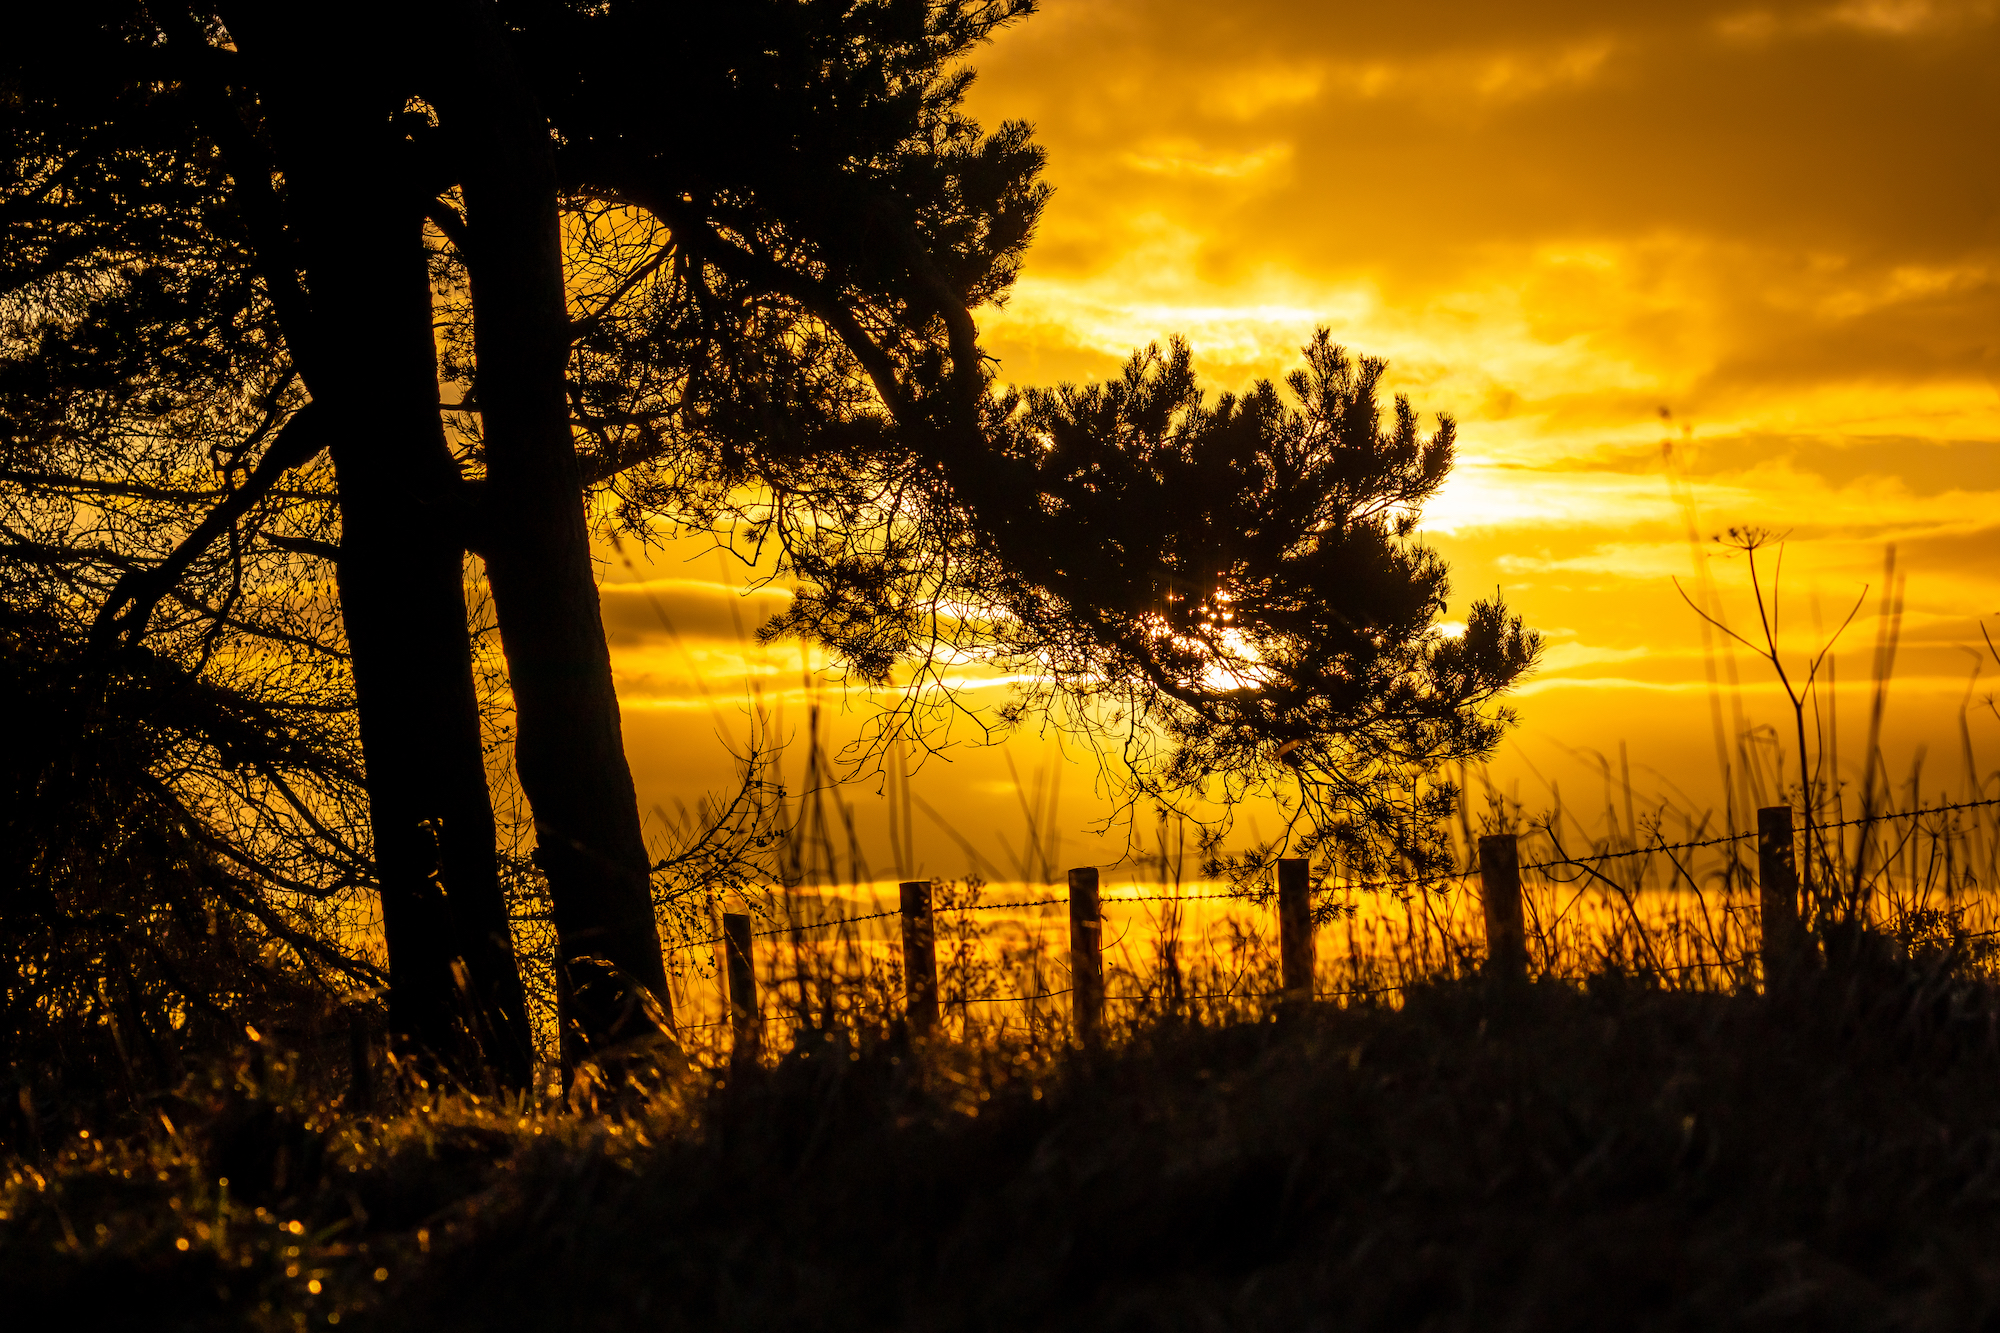 (1333) Golden Yellow January Sunset and Pine Trees, Tormain Wood, Ratho, Edinburgh West, Edinburgh, Scotland. Copyright David Wheater.jpg